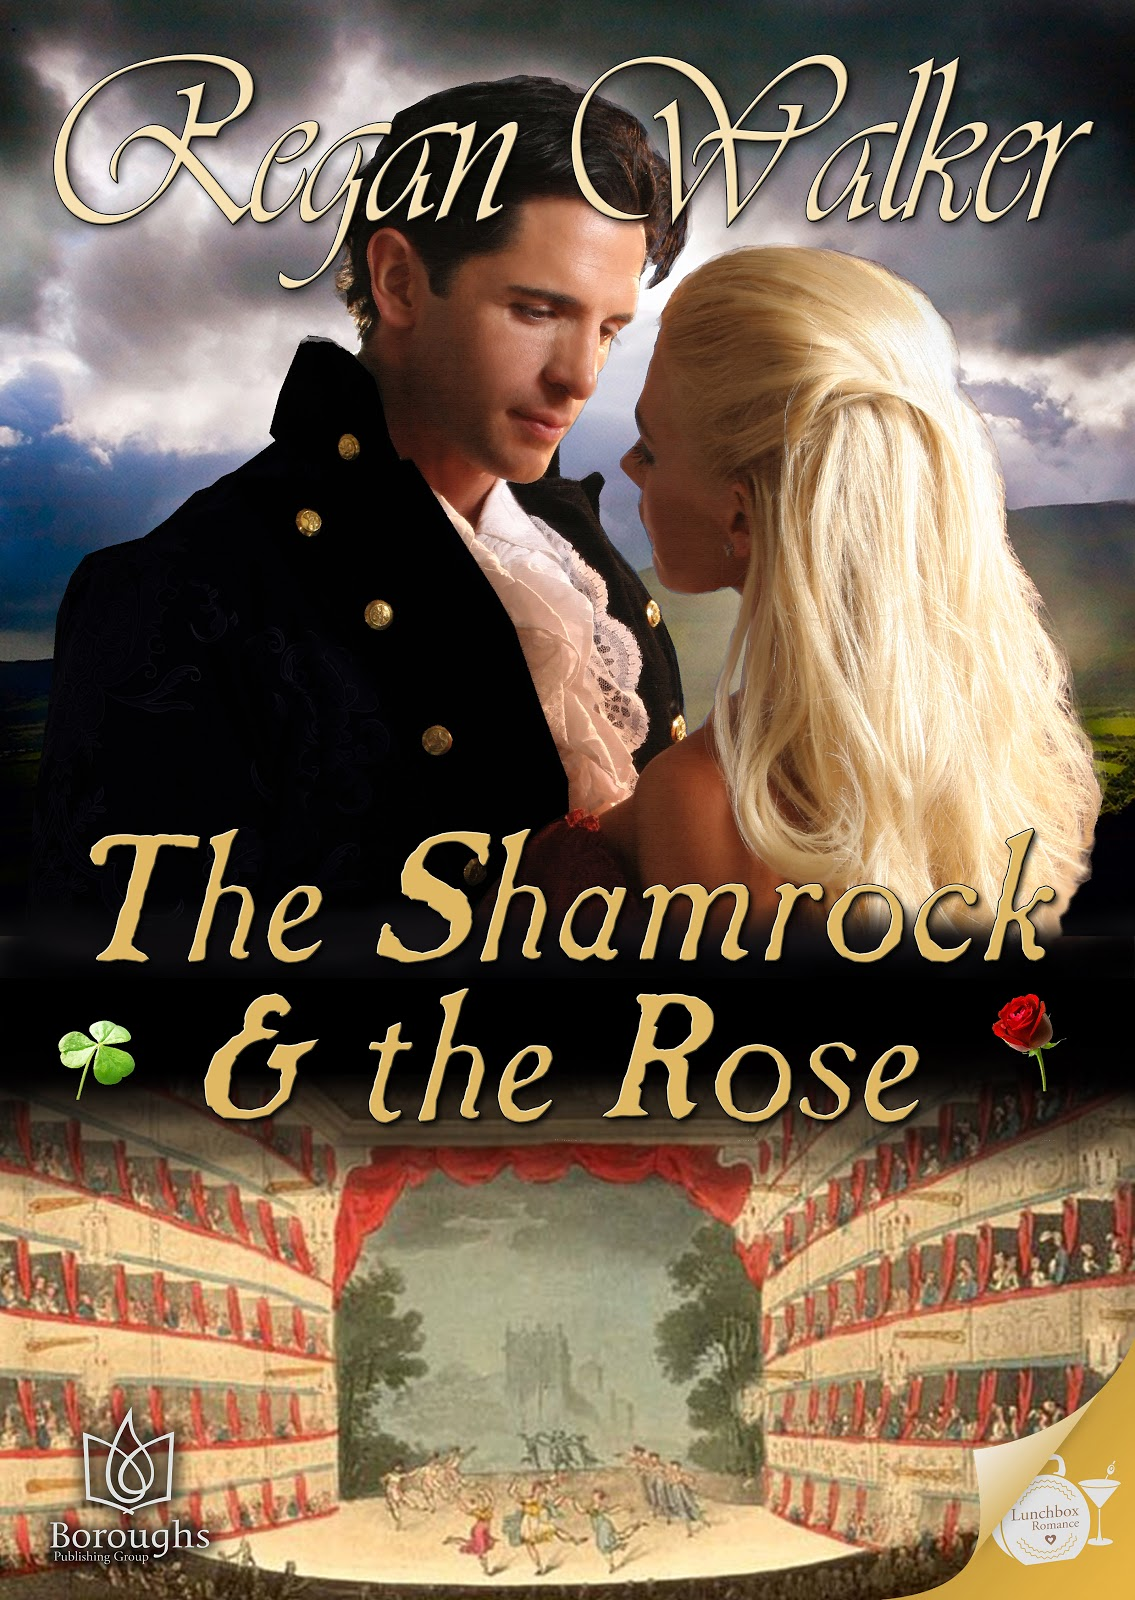 HISTORICAL ROMANCE REVIEW with Regan Walker: Daniel O